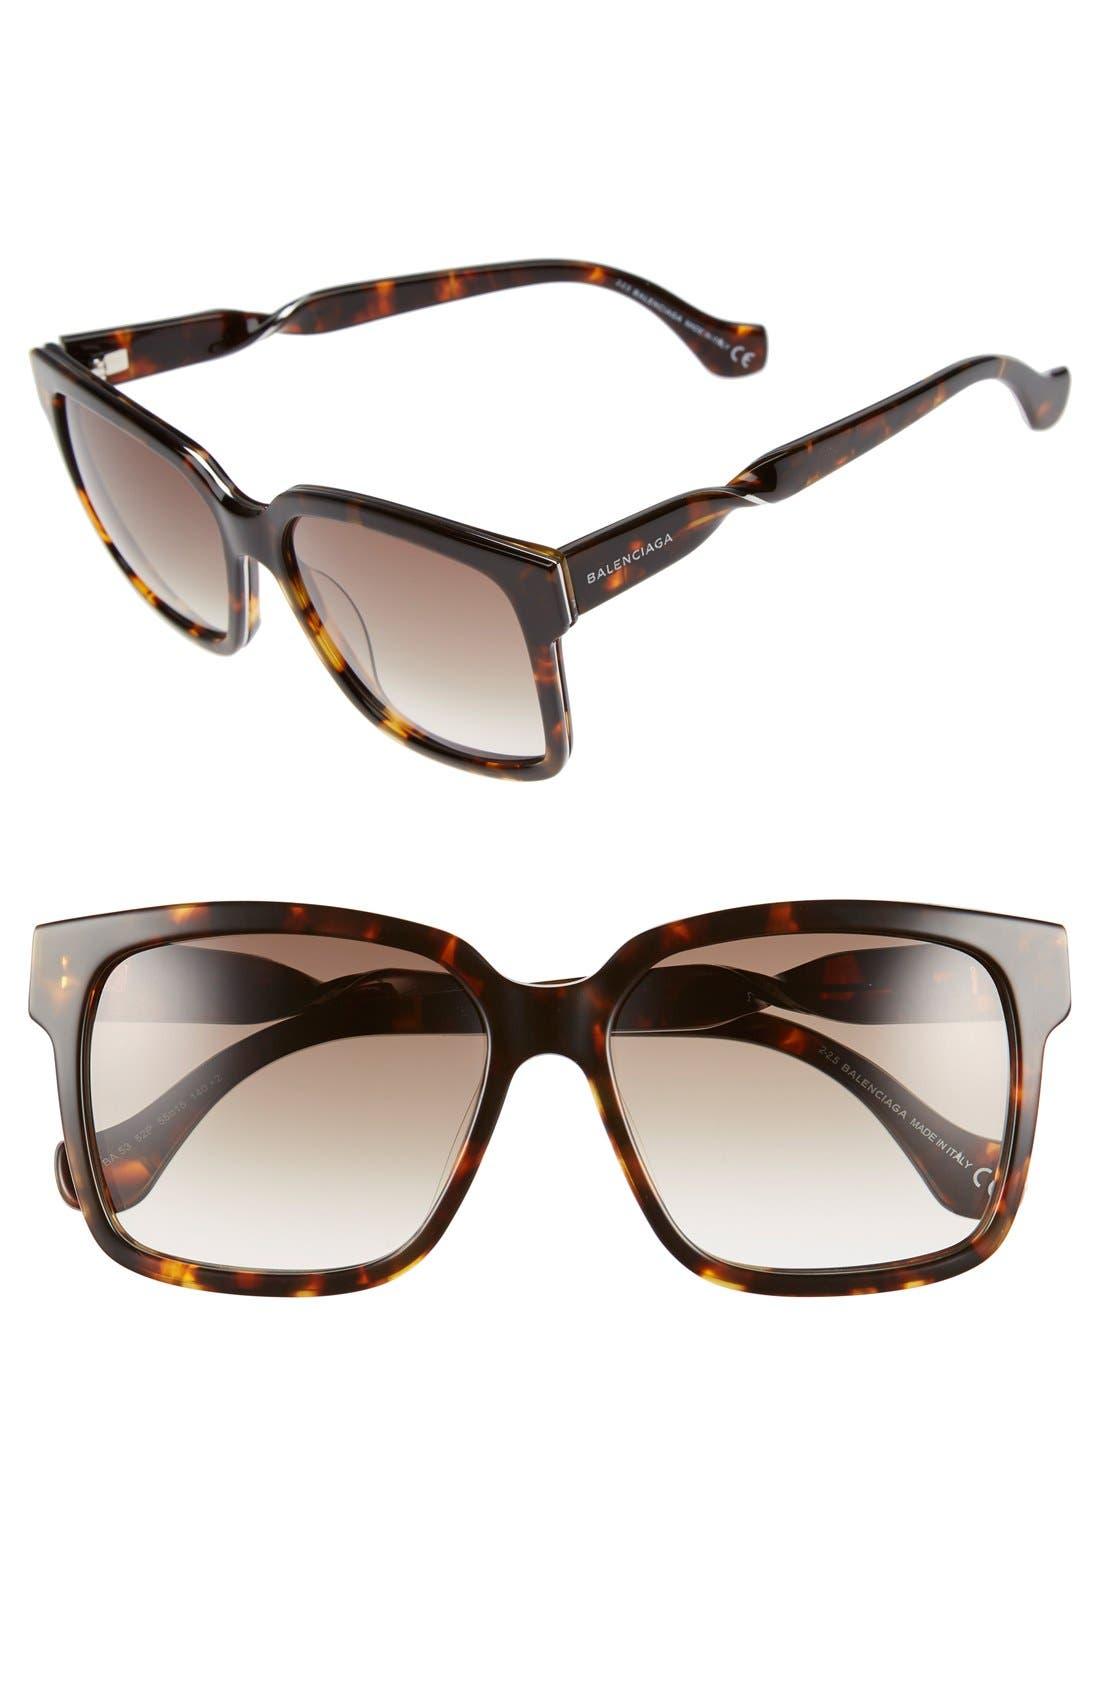 Paris 'BA0053' 55mm Cat Eye Sunglasses,                             Main thumbnail 1, color,                             Dark Havana/ Gradient Green